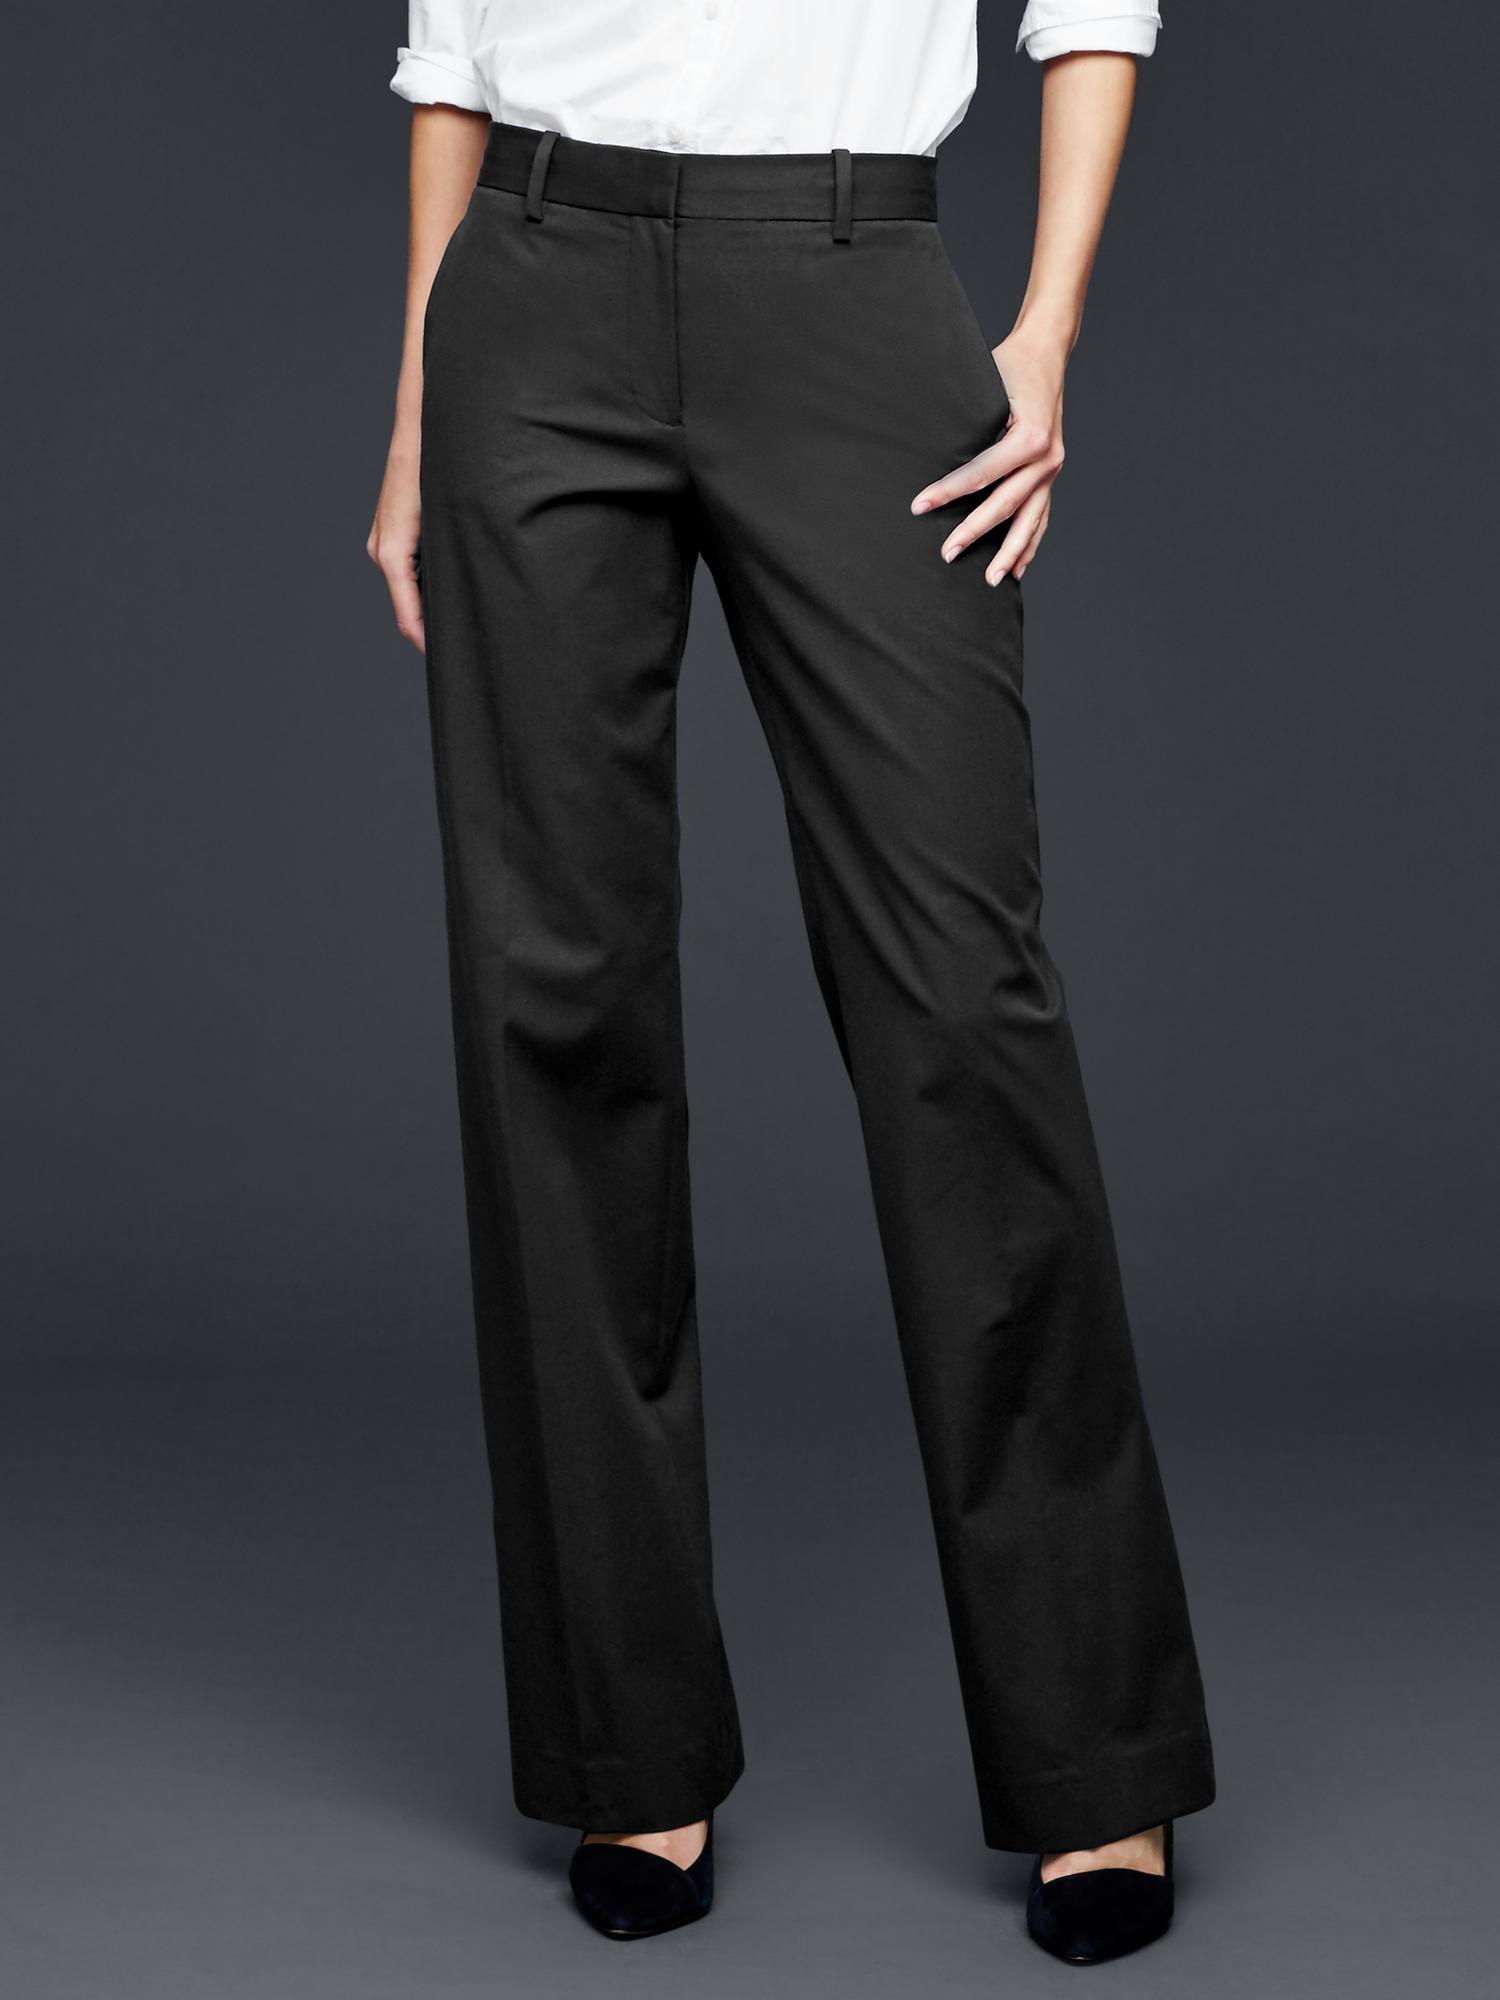 35a93f51f10 Modern trouser pants